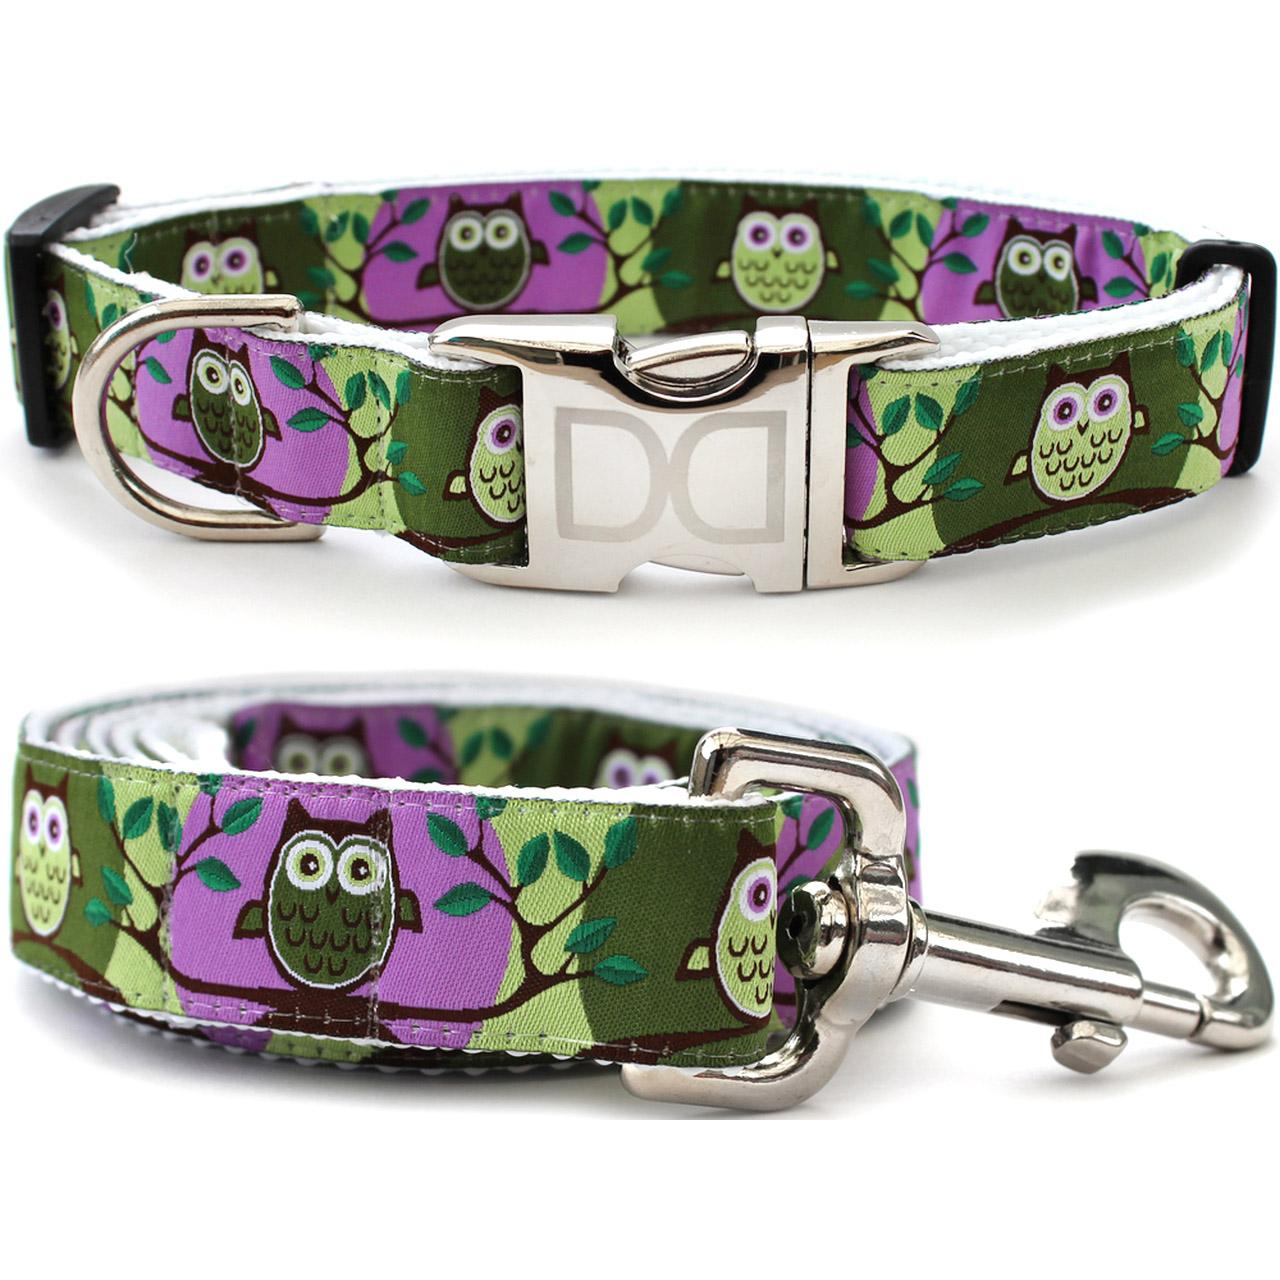 H'Owl Grape and Avocado Dog Collar and Leash Set by Diva Dog